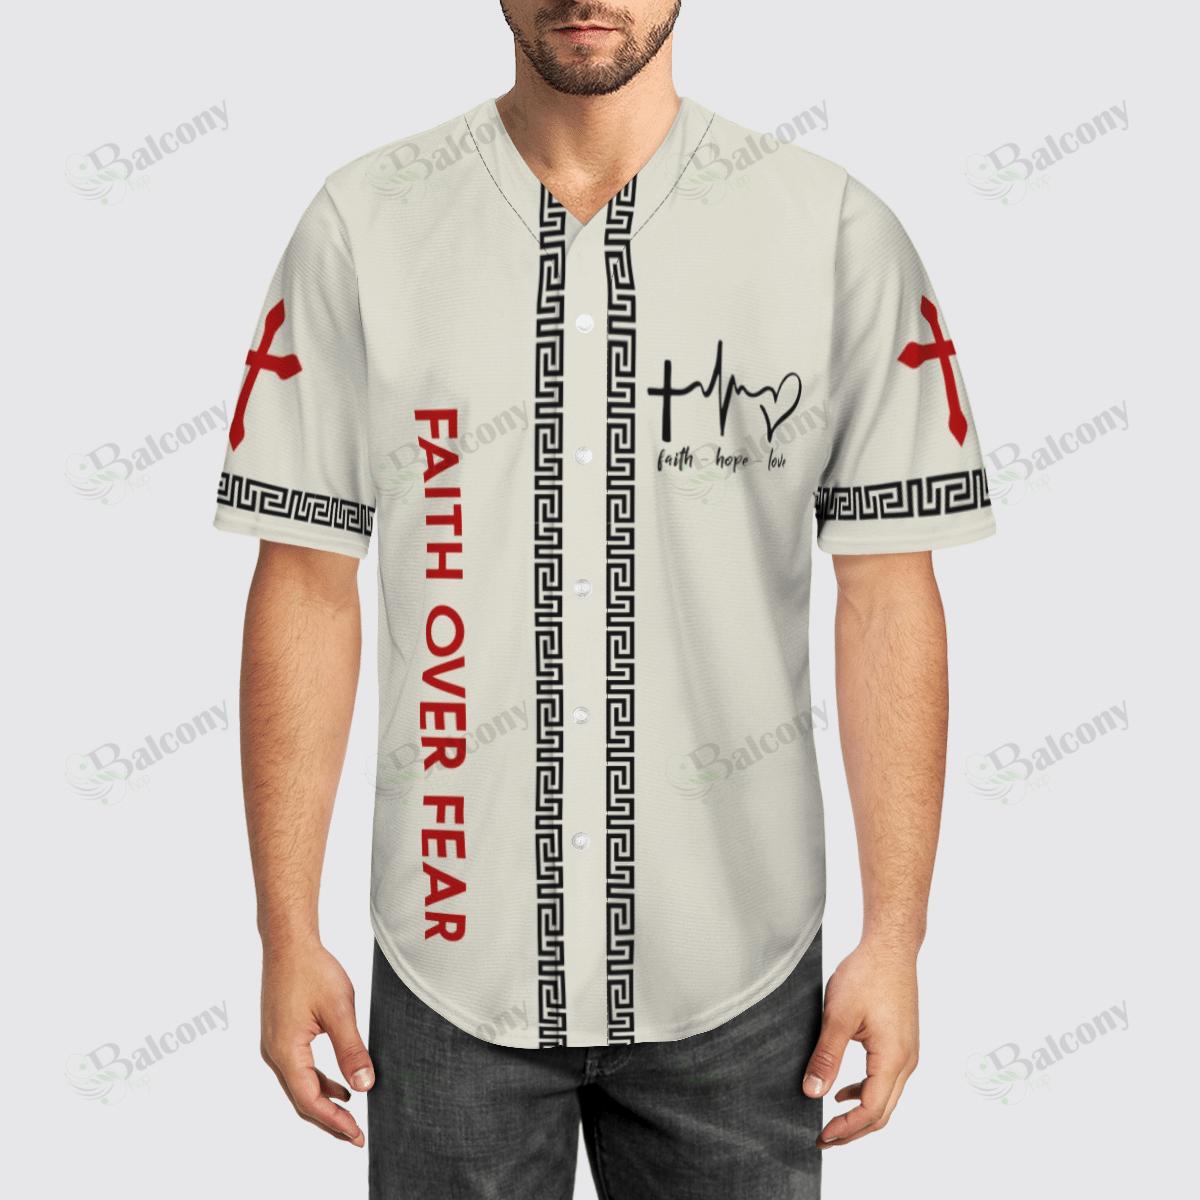 Faith Over Fear Jesus Baseball Jersey shirt